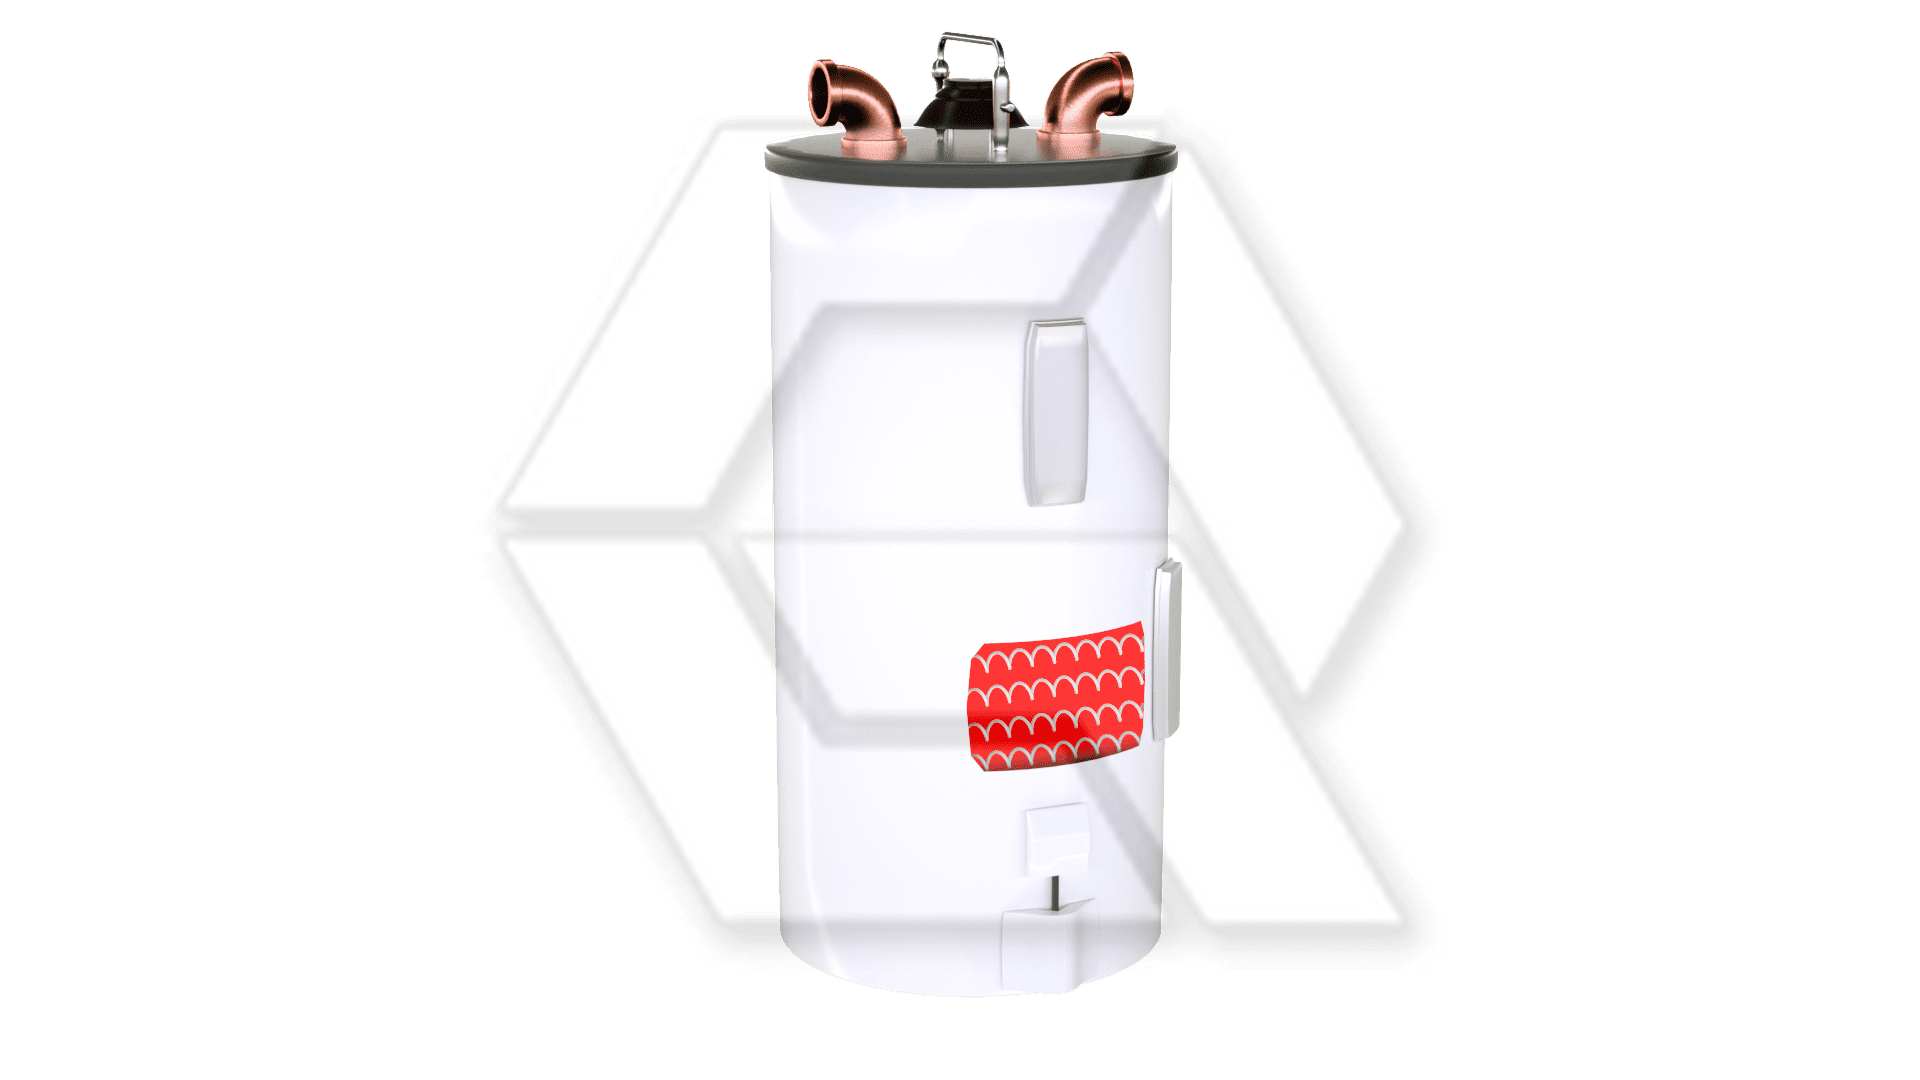 Hot Water Heater Open